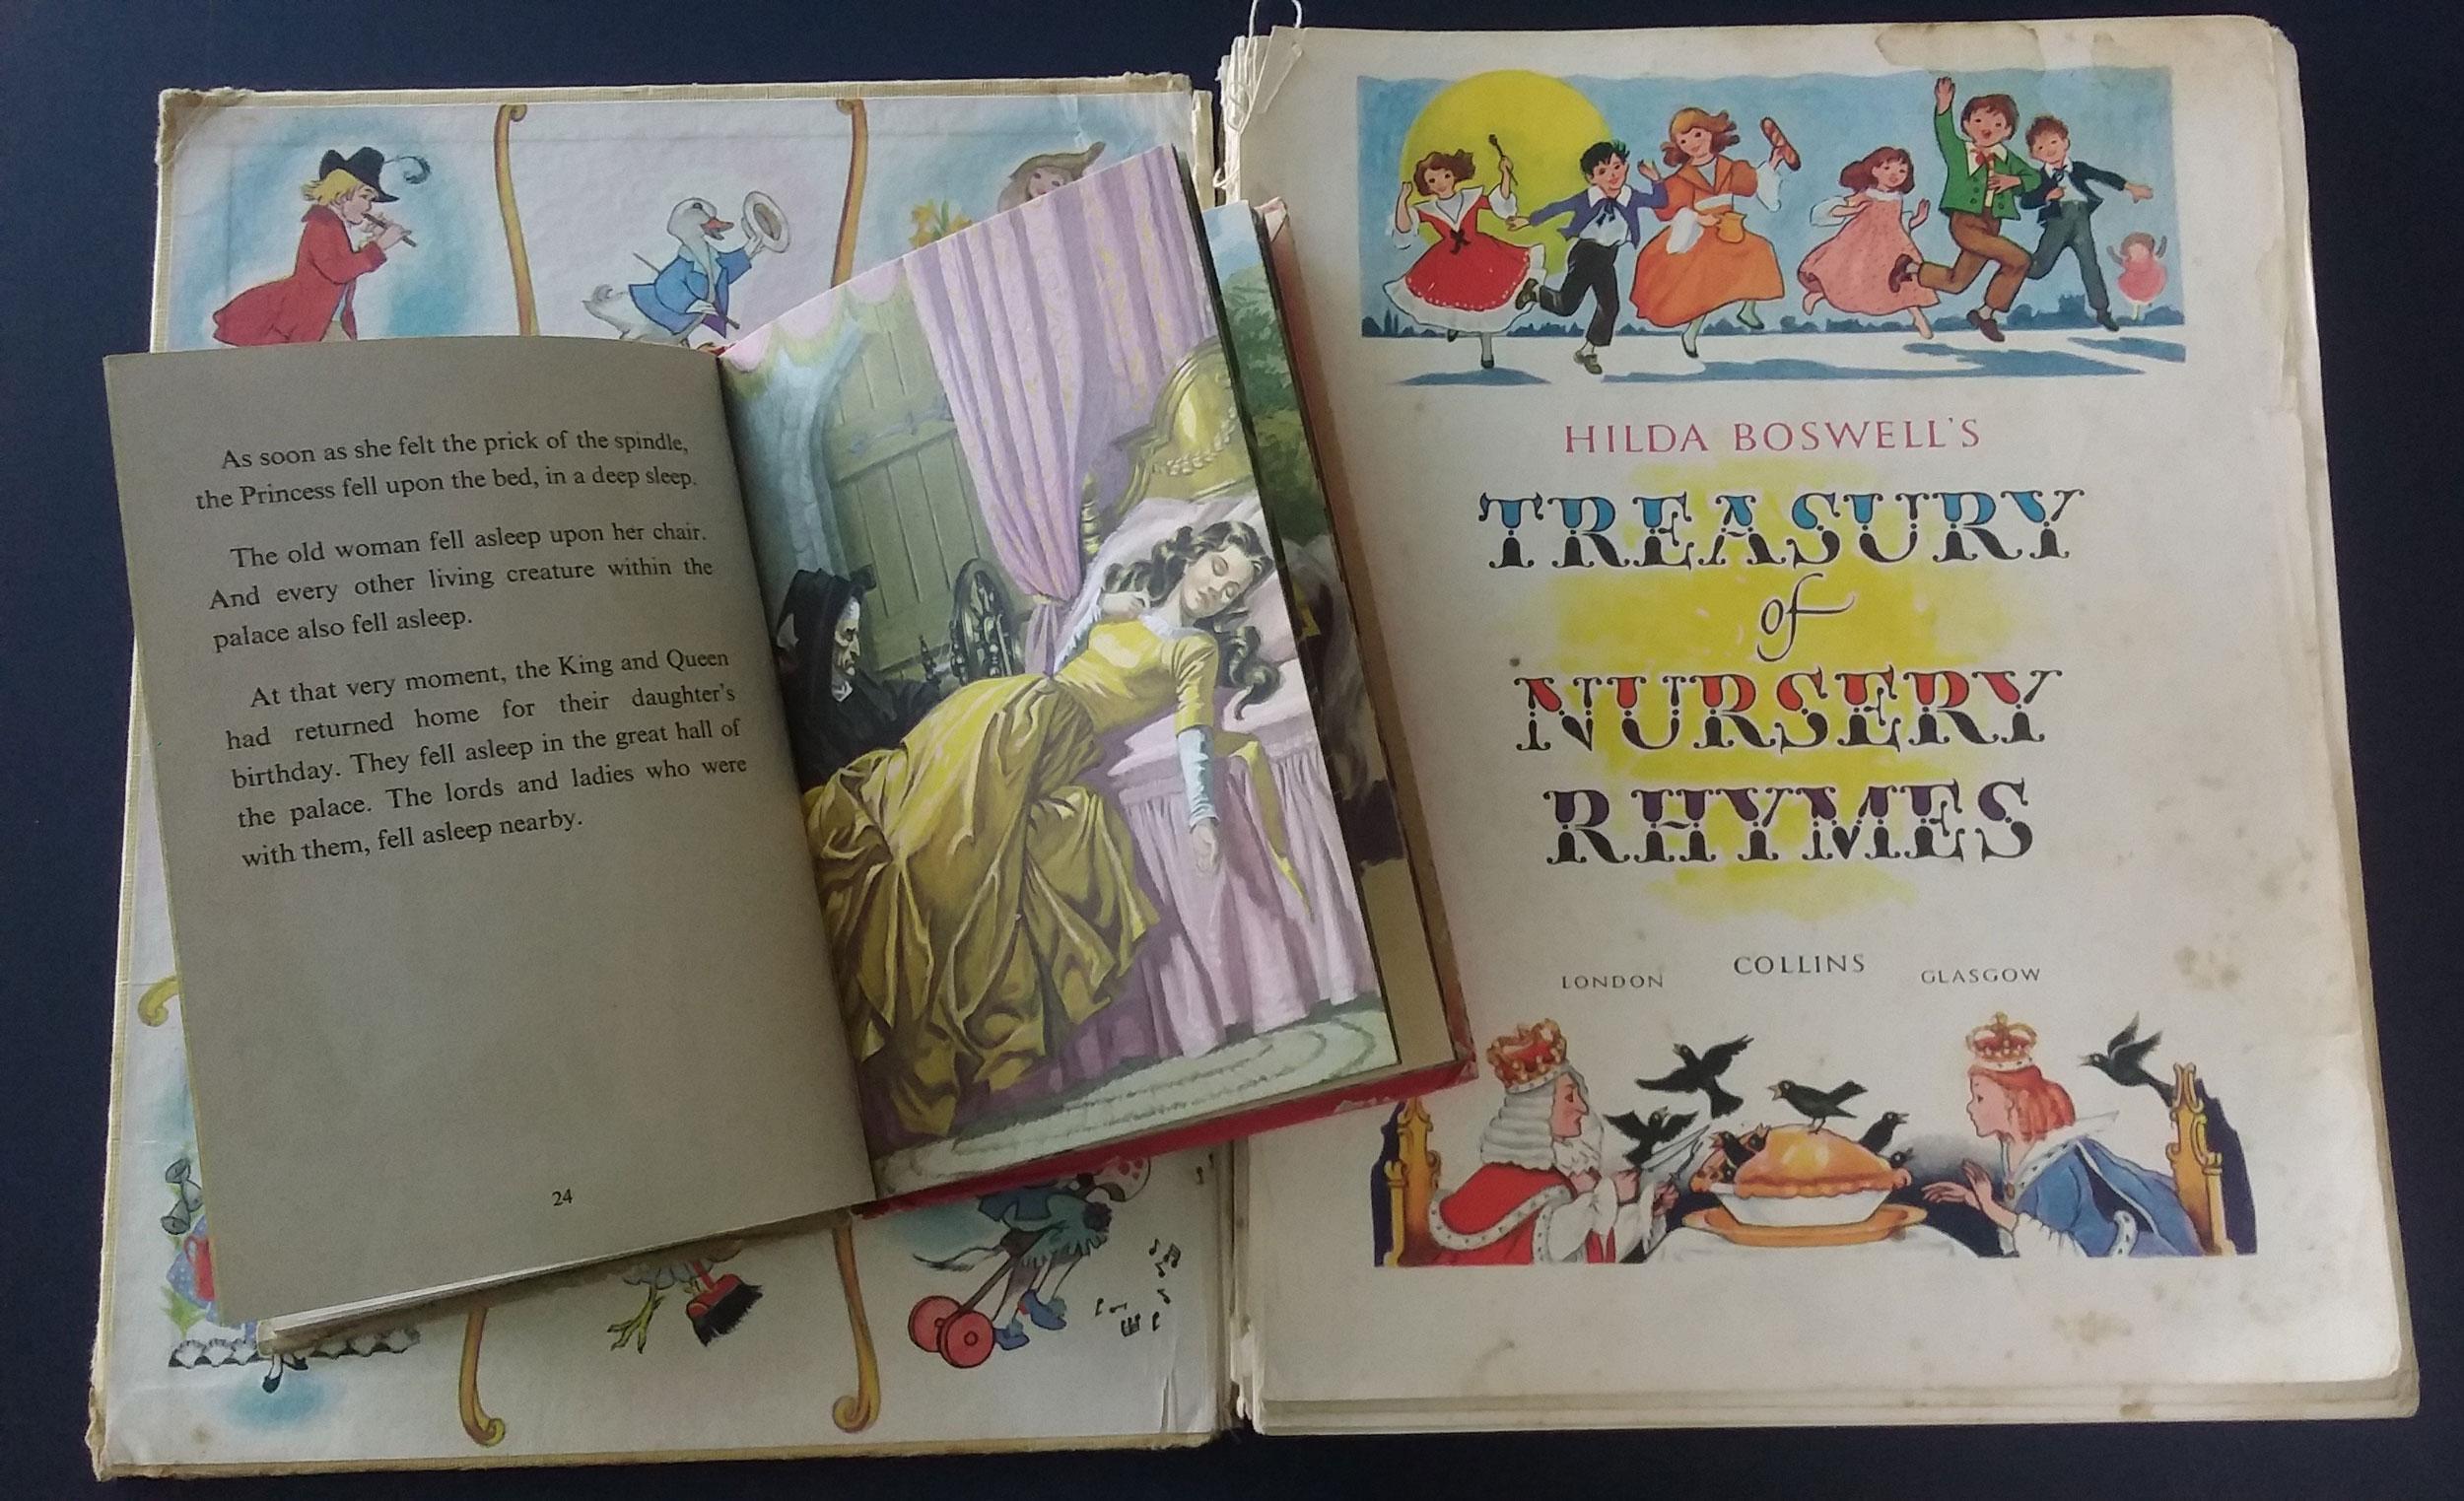 Memories from childhood:  Ladybird books  Sleeping Beauty  1965 illus. Eric Winter & Hilda Boswell's  Treasury of Nursery Rhymes